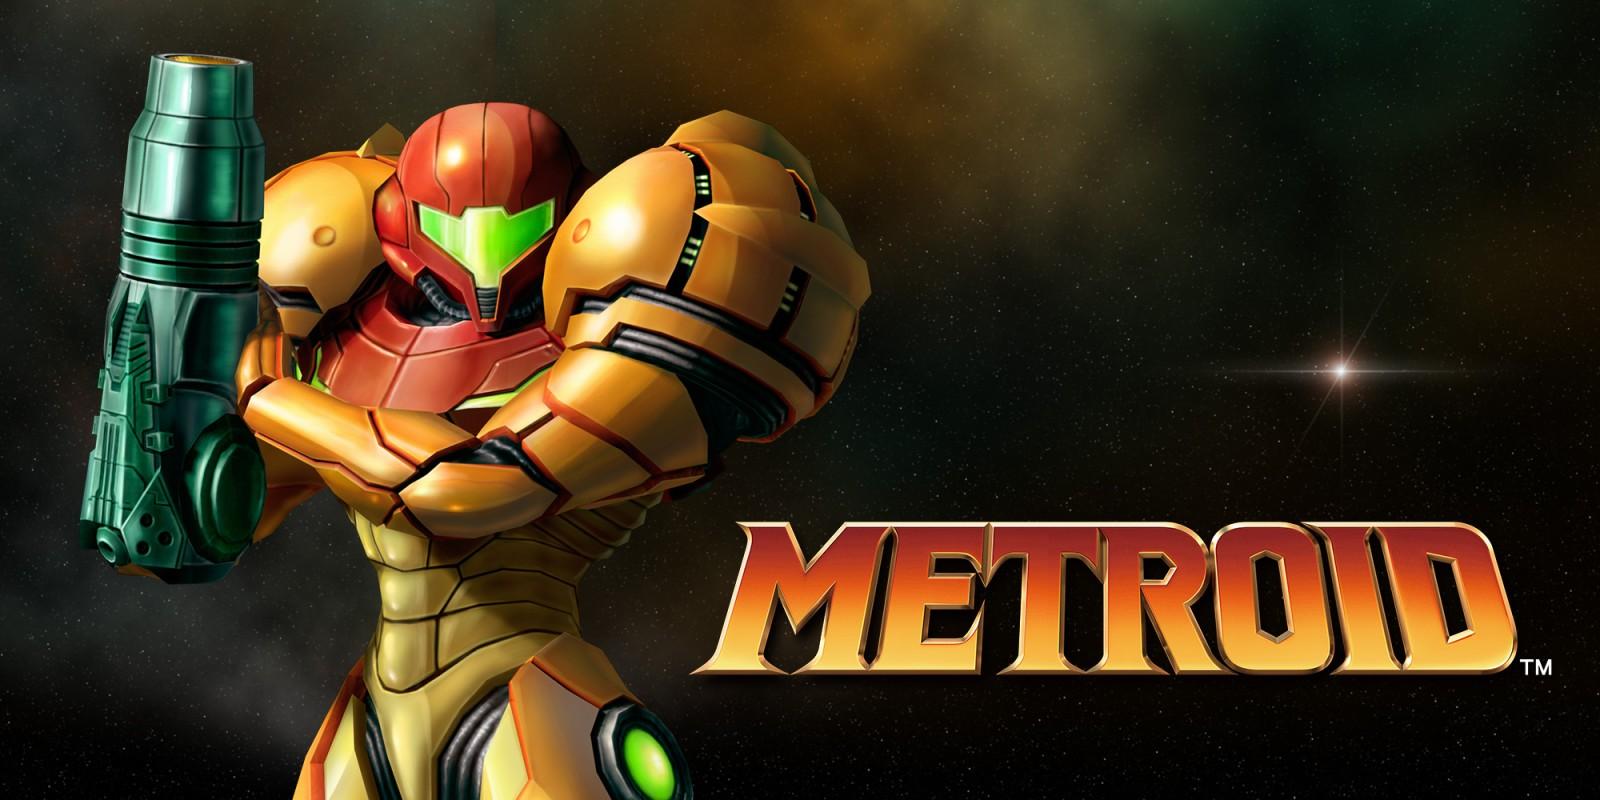 [H2x1_CharacterHub_Metroid_image1600w]